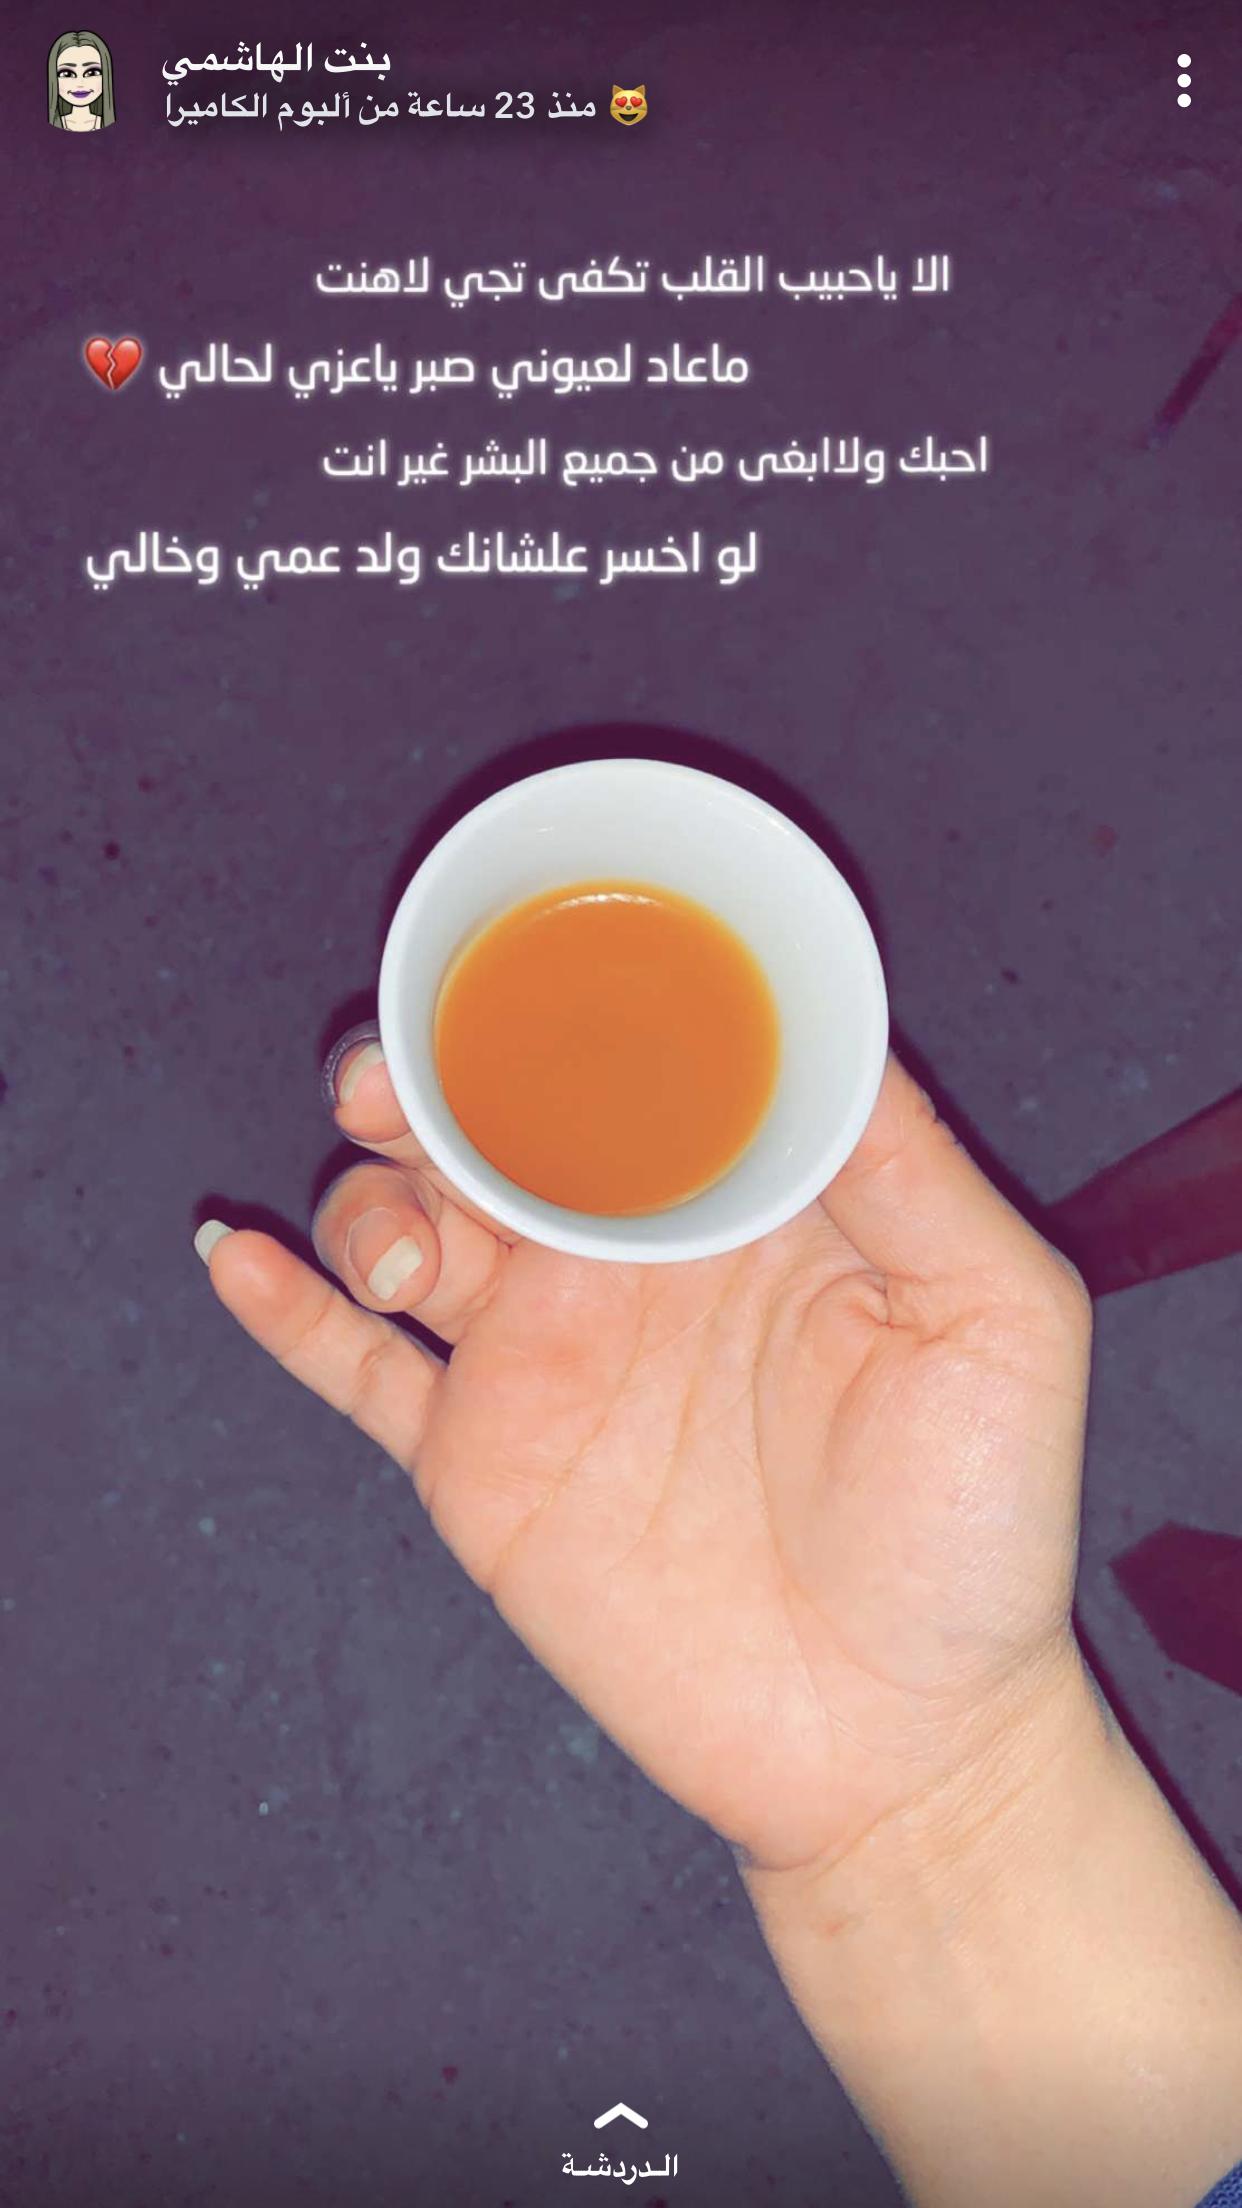 Pin By Reem On بنت الهاشمي Yui